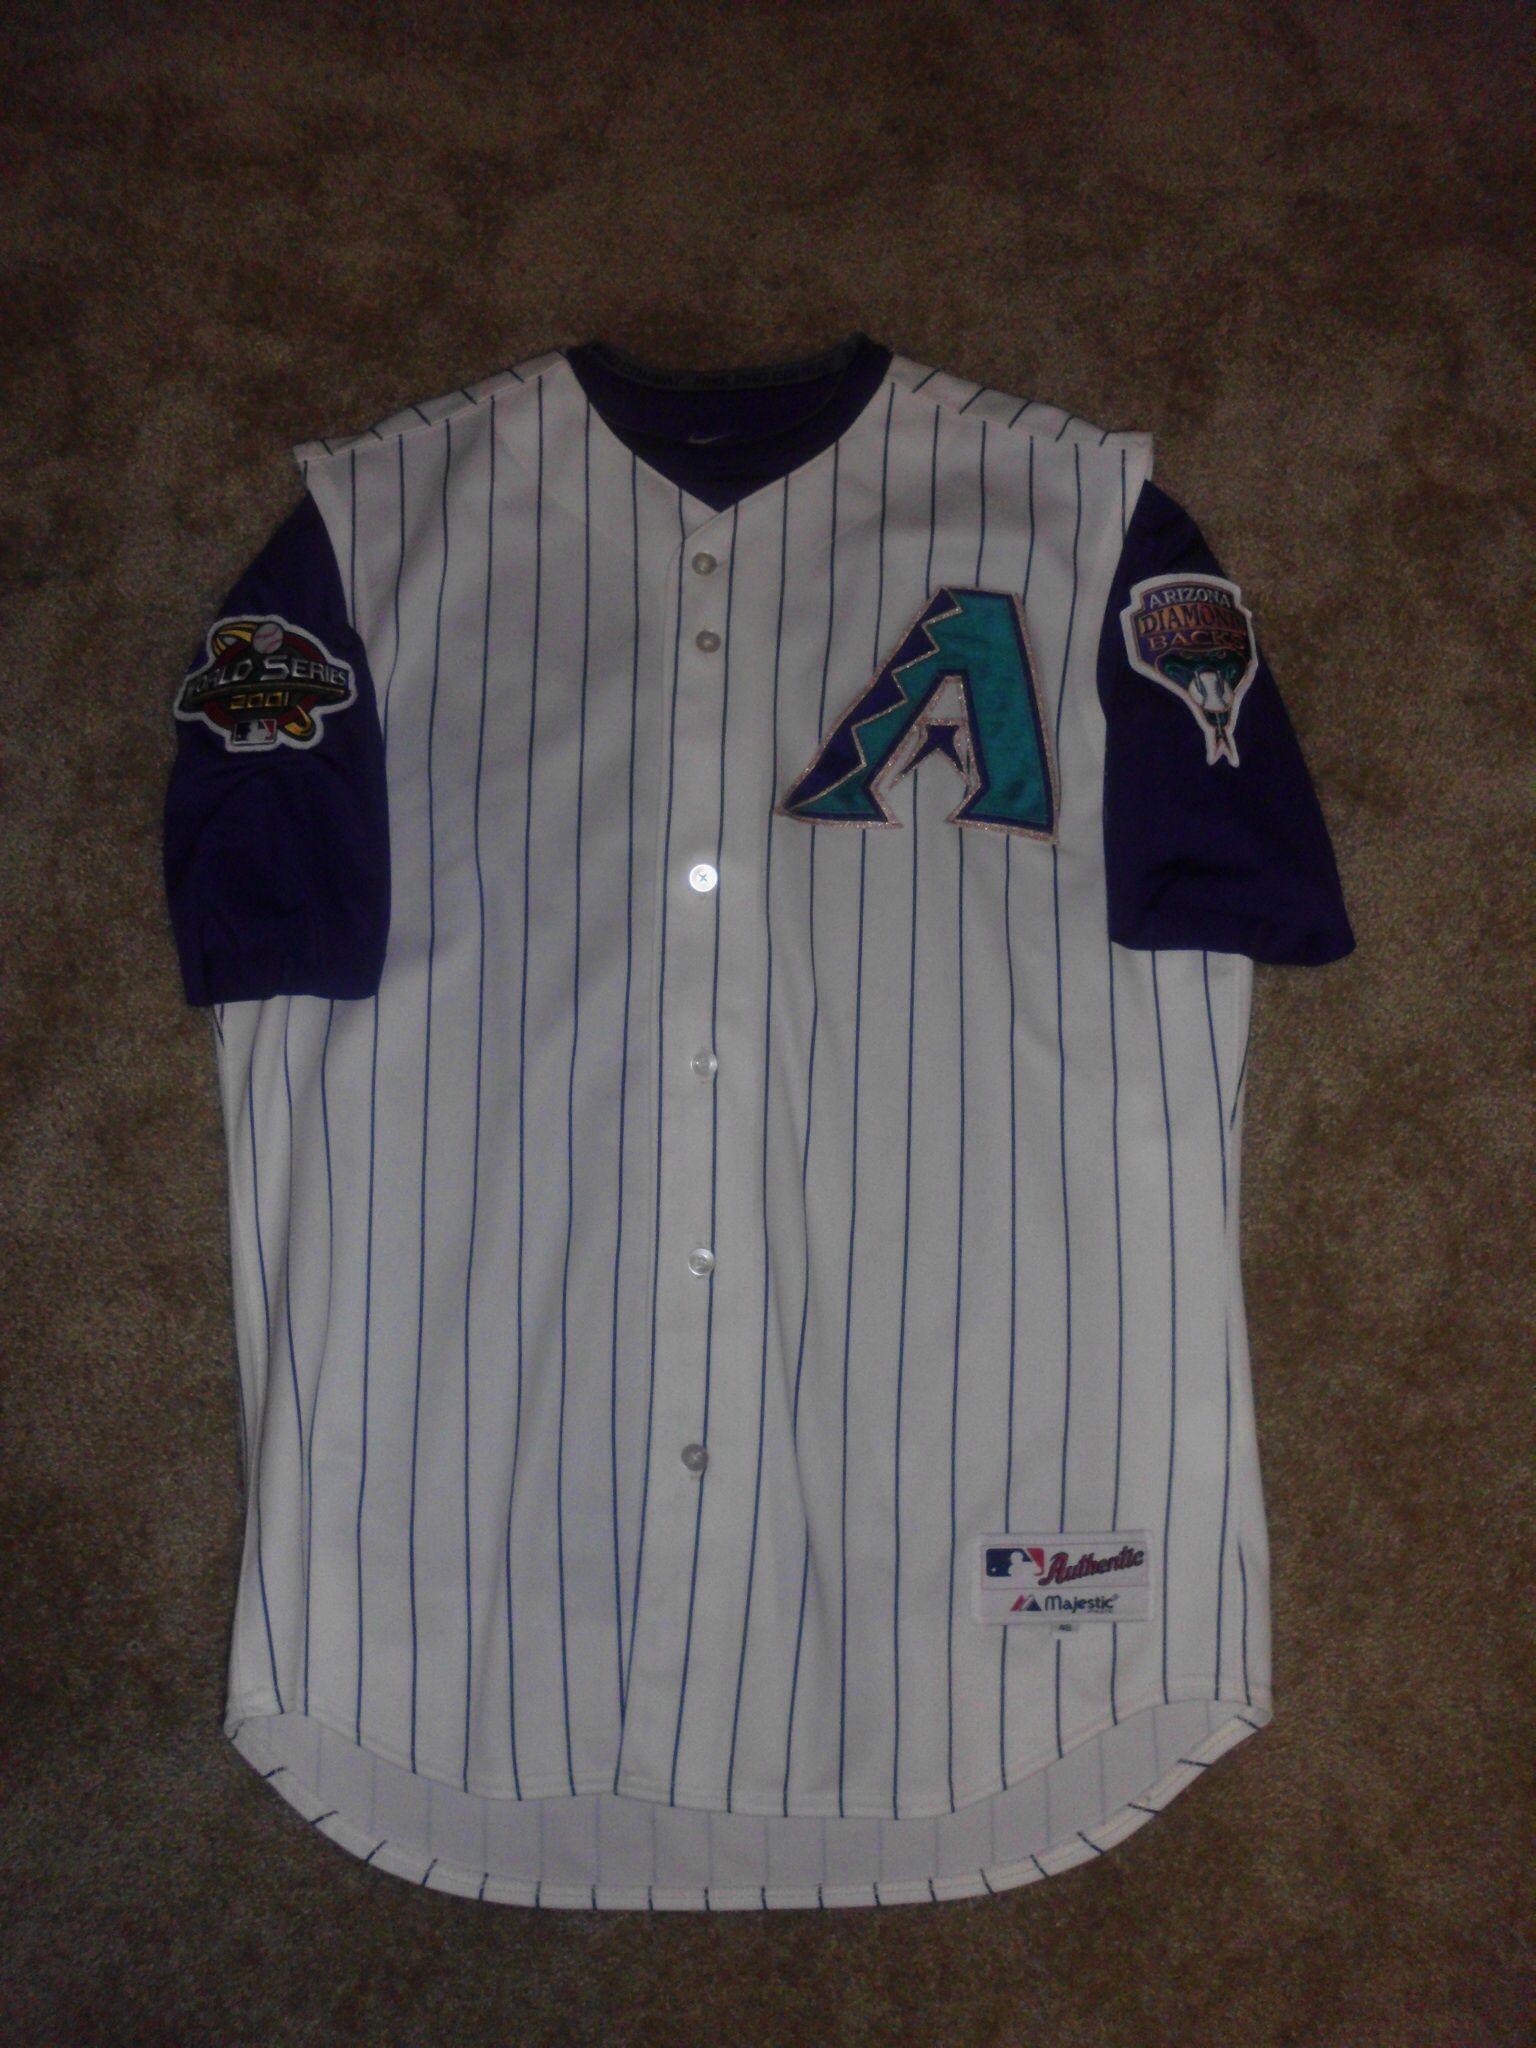 wholesale dealer 5c92b 230a9 arizona diamondbacks sleeveless jersey